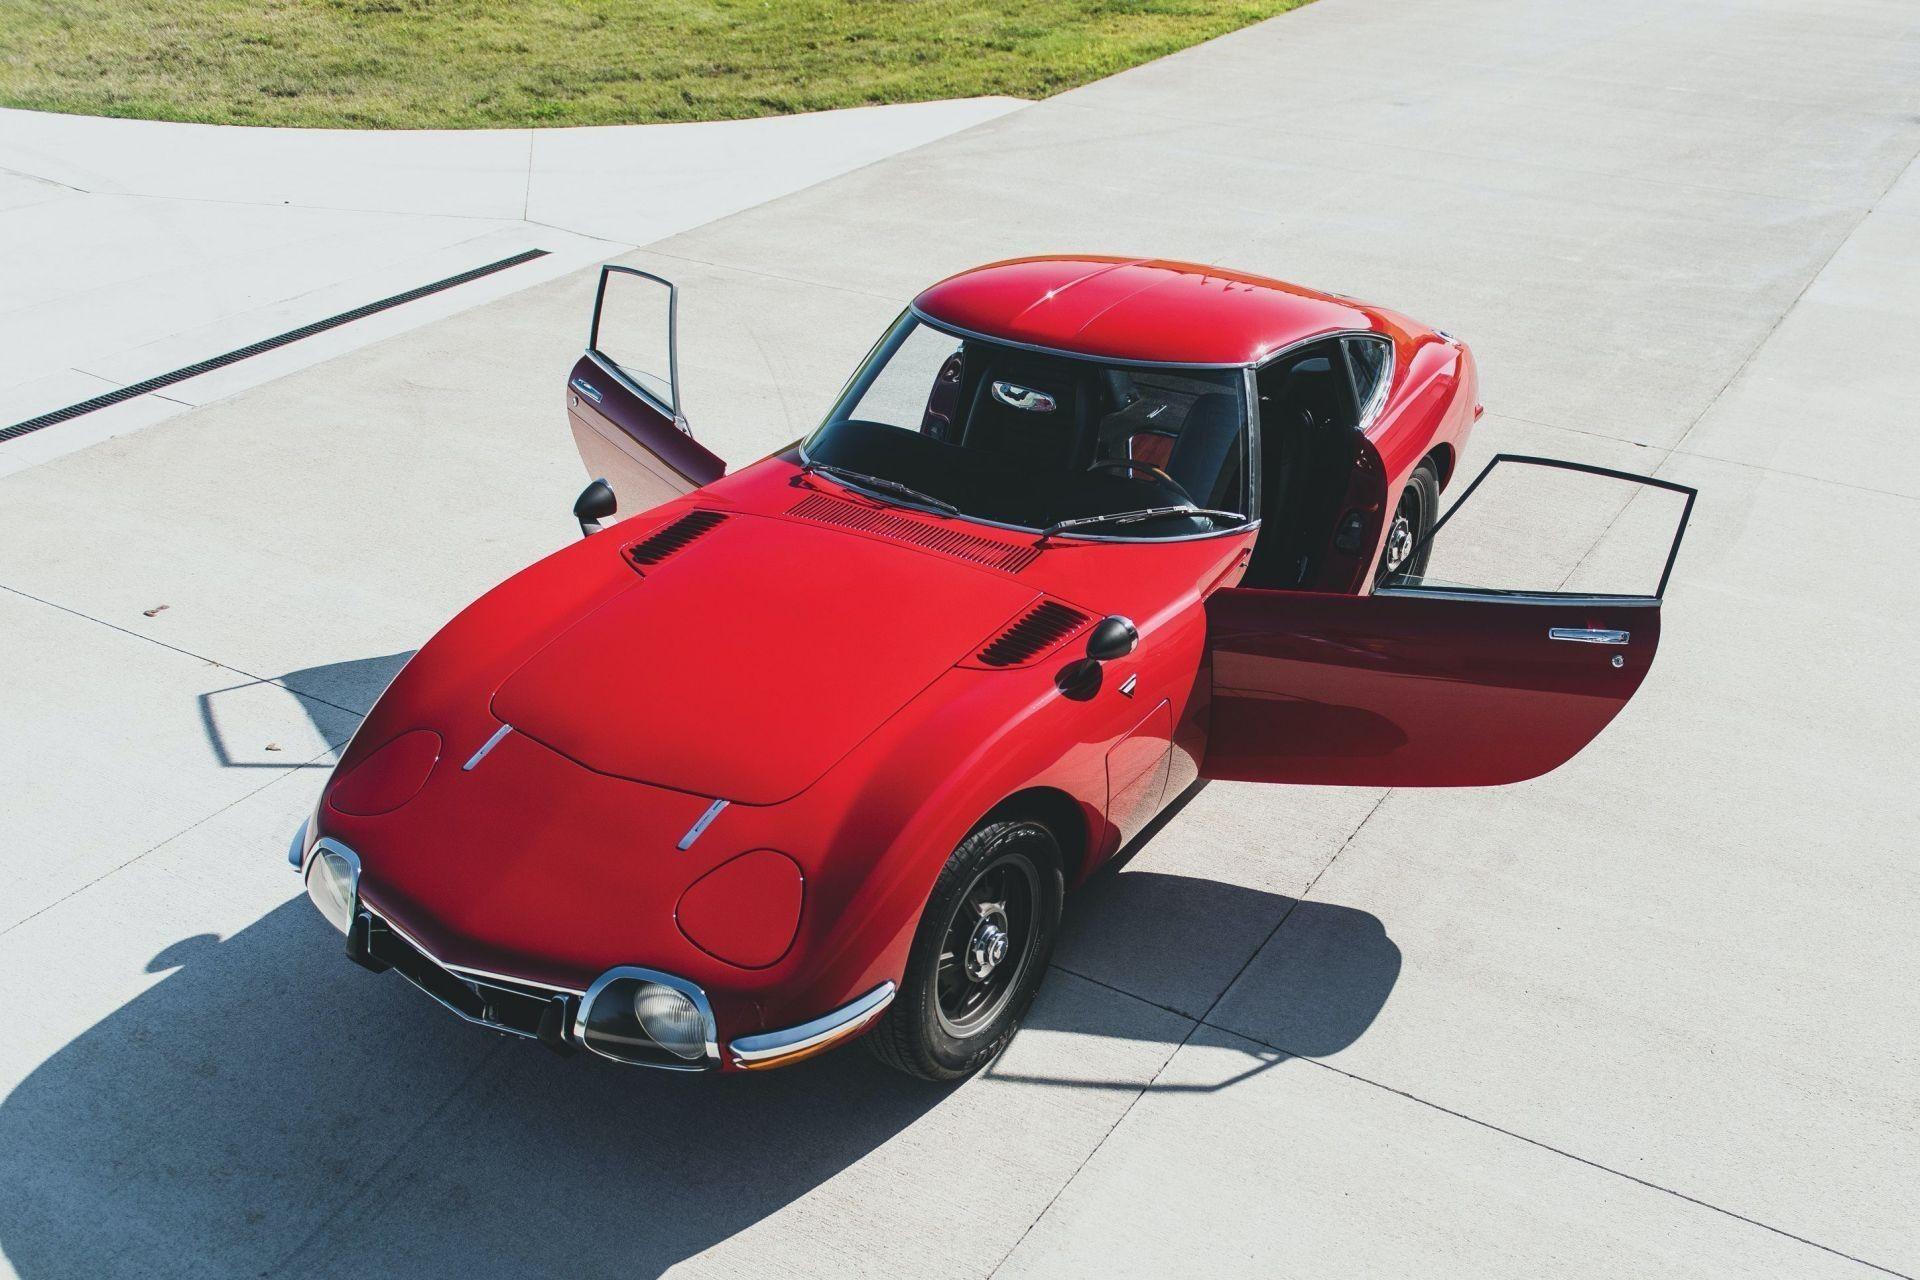 Легендарную Toyota 2000GT 1967 с левым рулем продали на аукционе